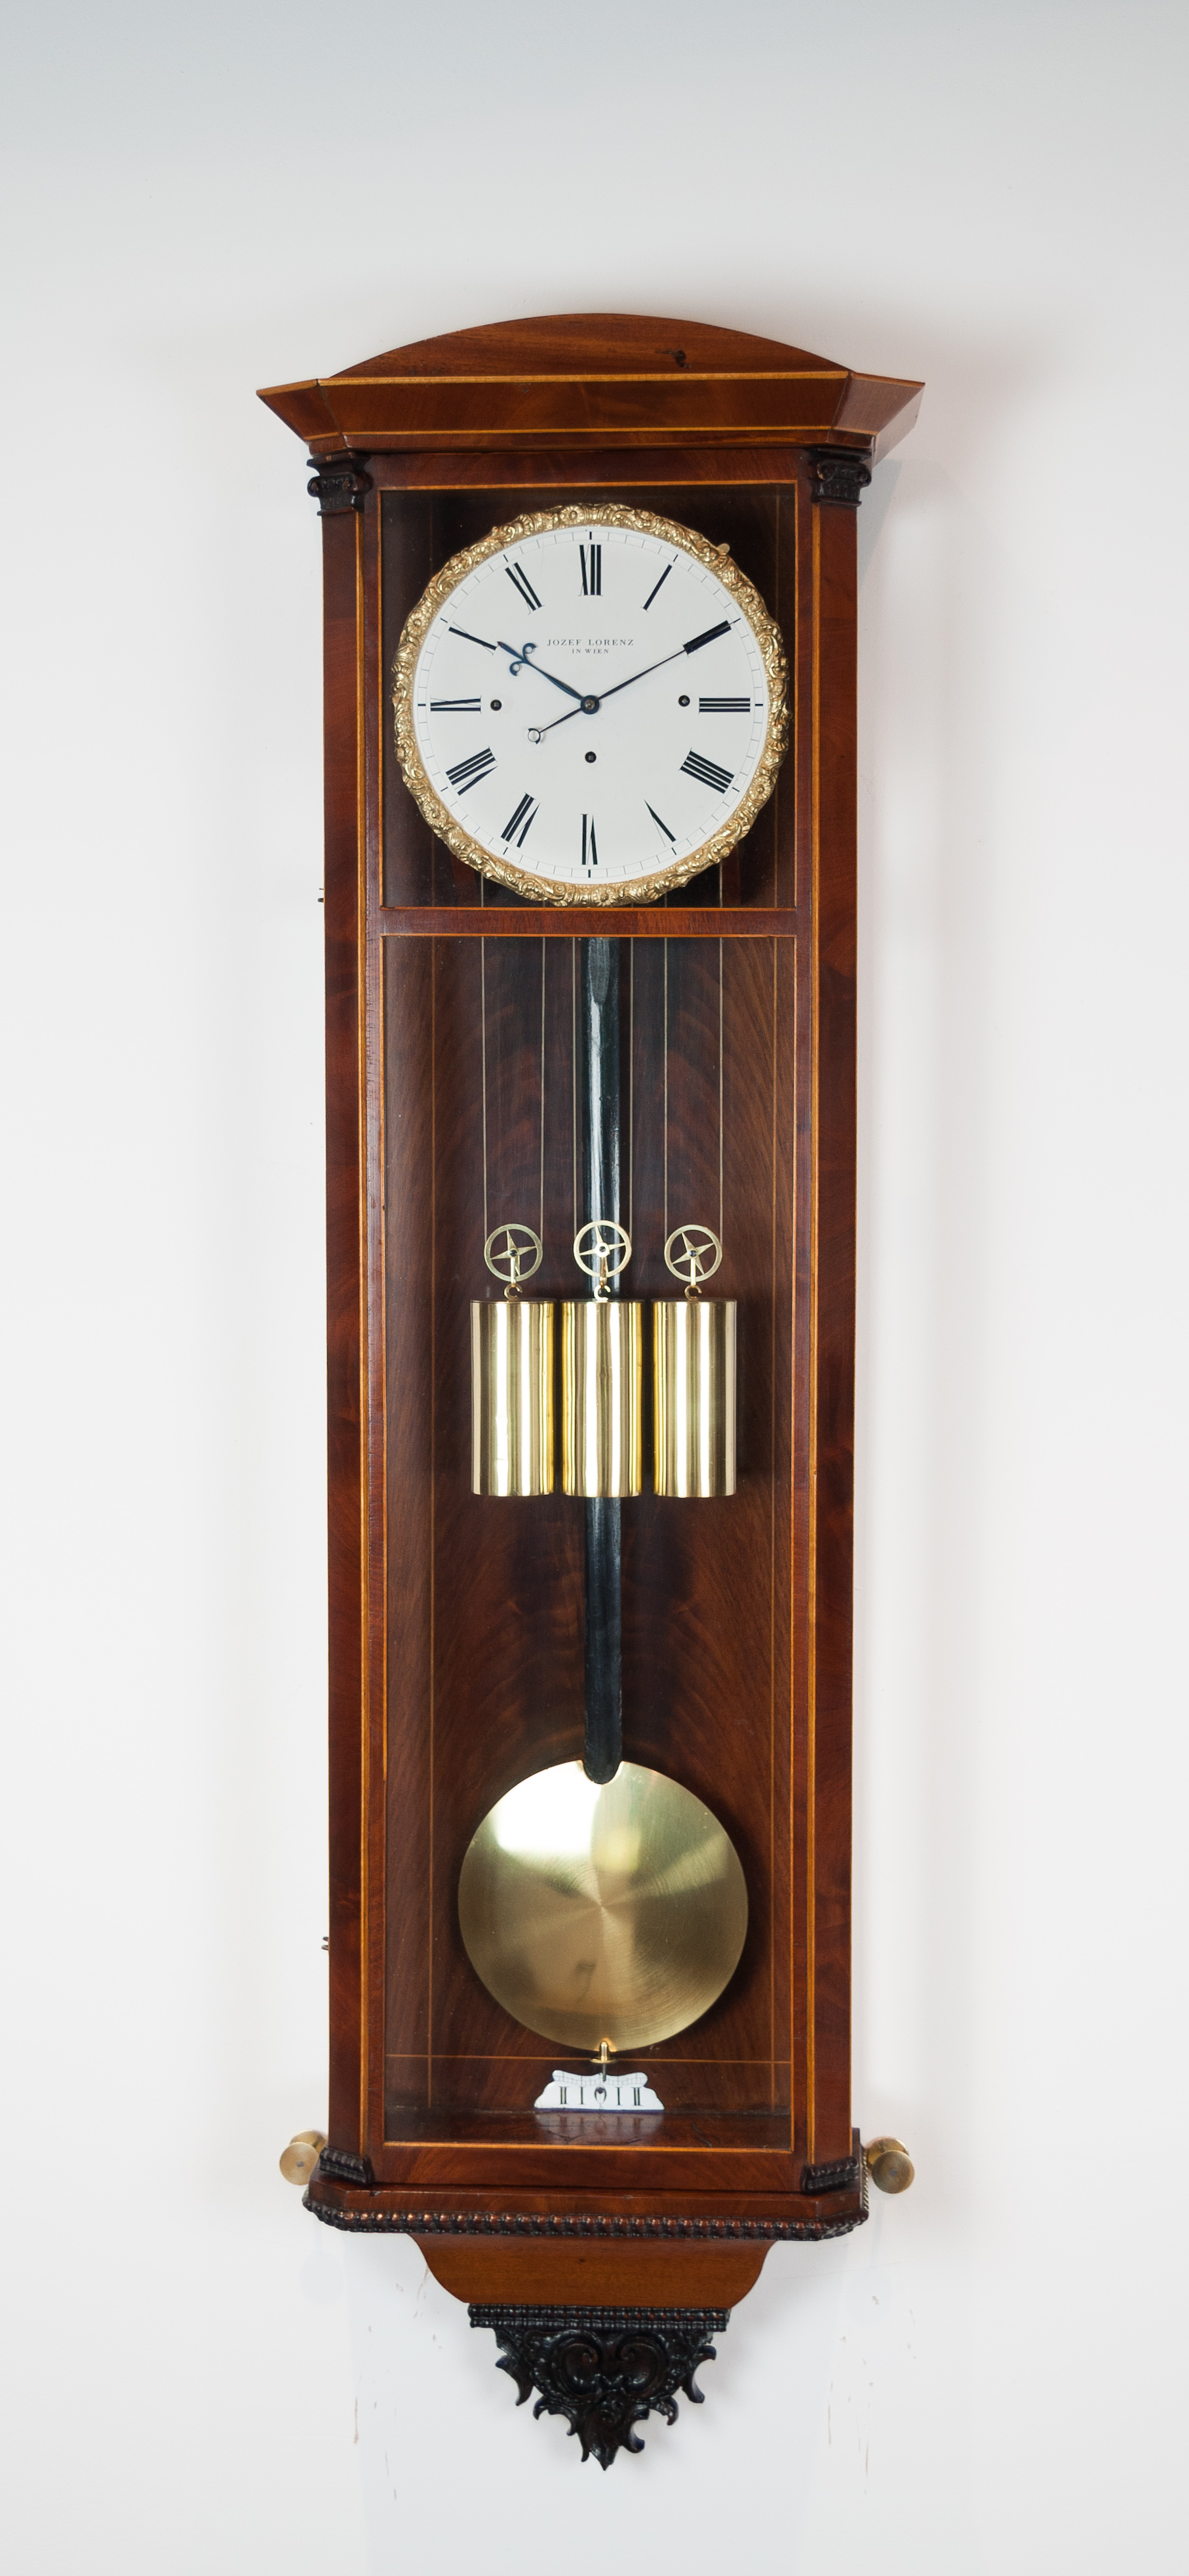 Story Antique Clocks image (2 of 11)